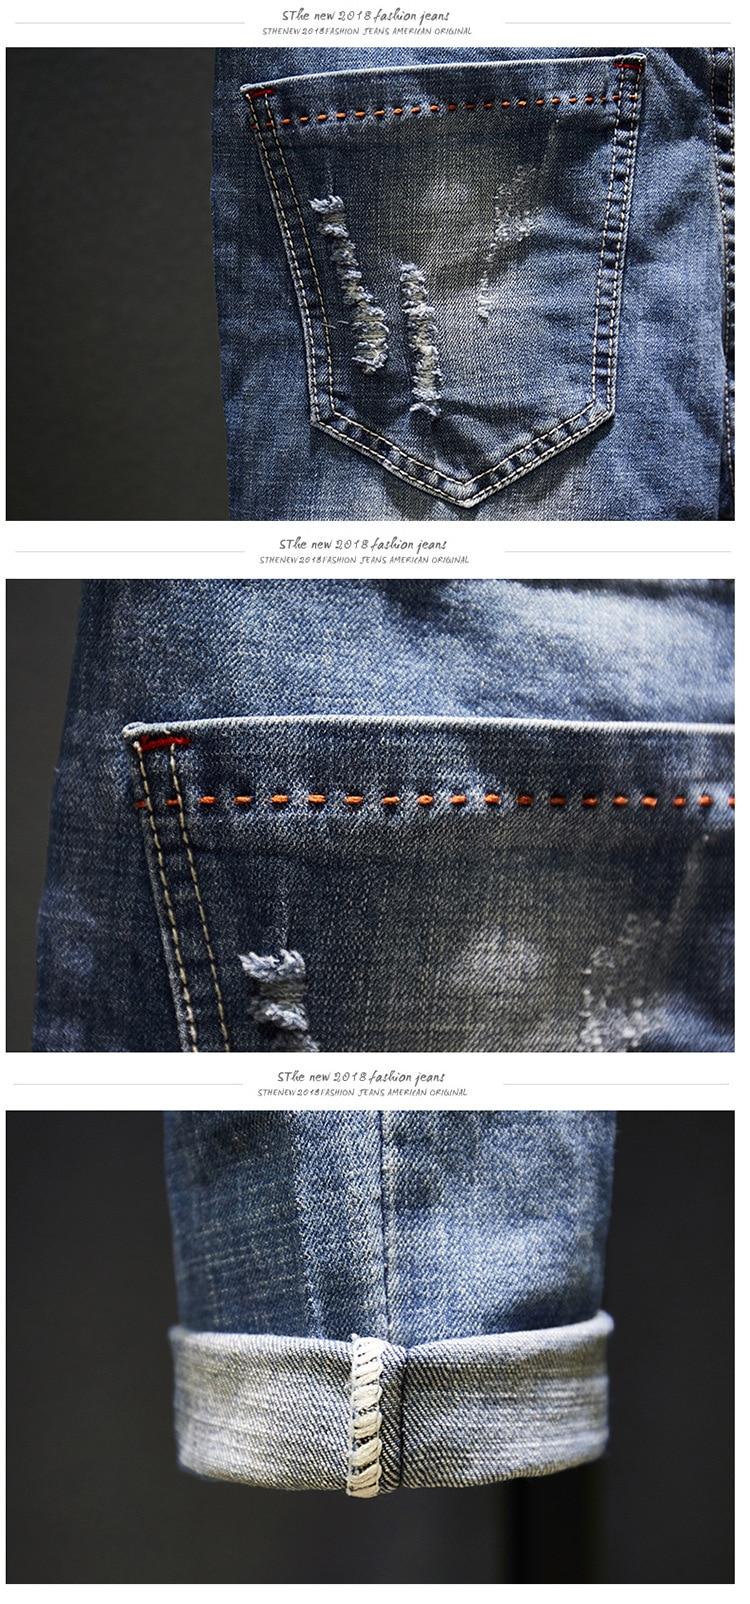 KSTUN Biker Jeans Men Ripped Slim Fit Light Blue Stretch Fashion 2020 Streetwear Frayed Hip Hop Distressed Denim Jeans Pants Man 13